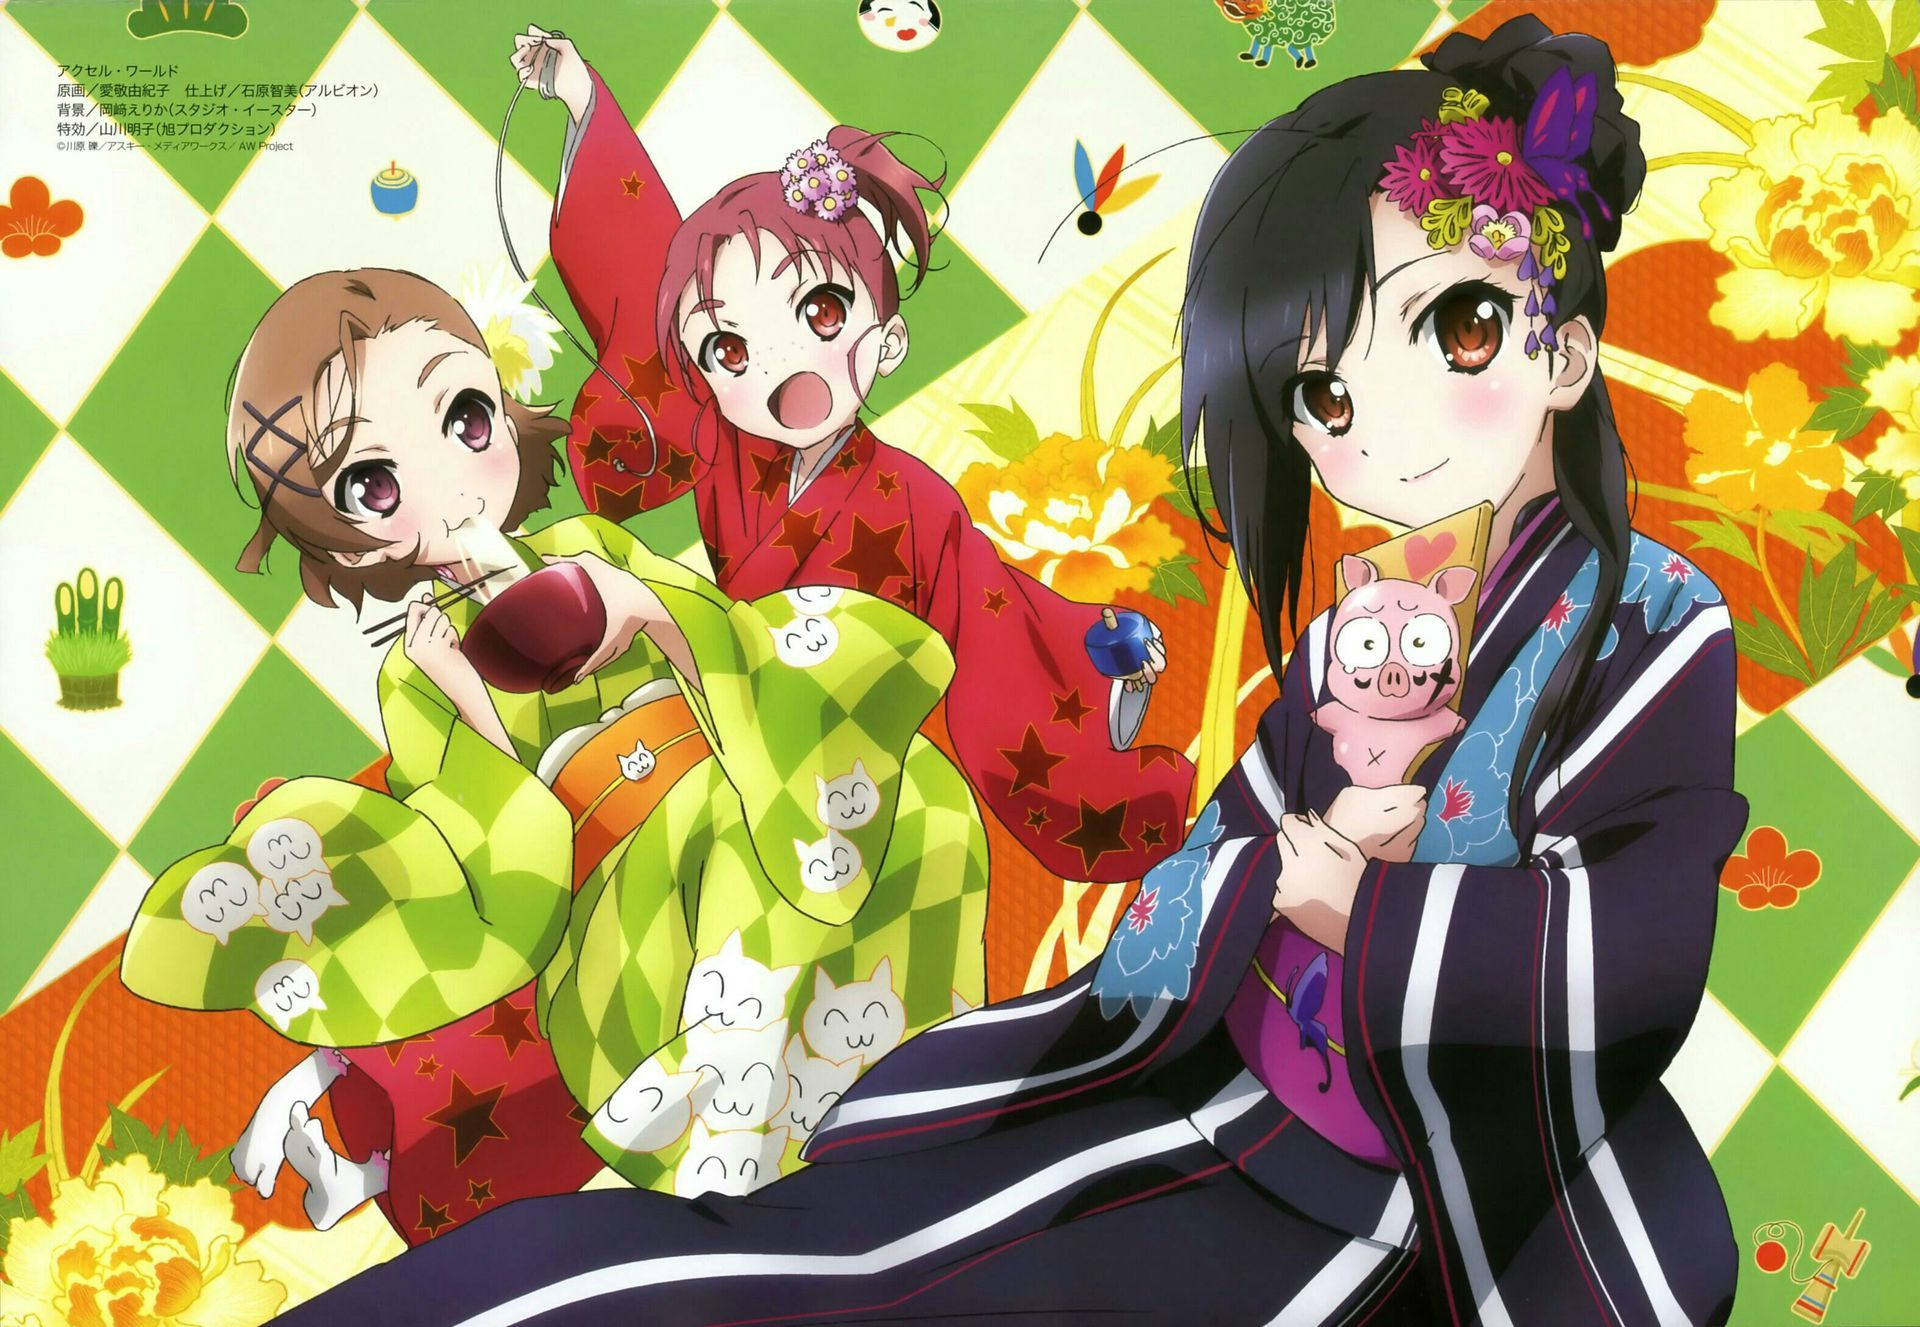 Kumpulan Gambar Anime Jepang Req Off Sementara Accel World